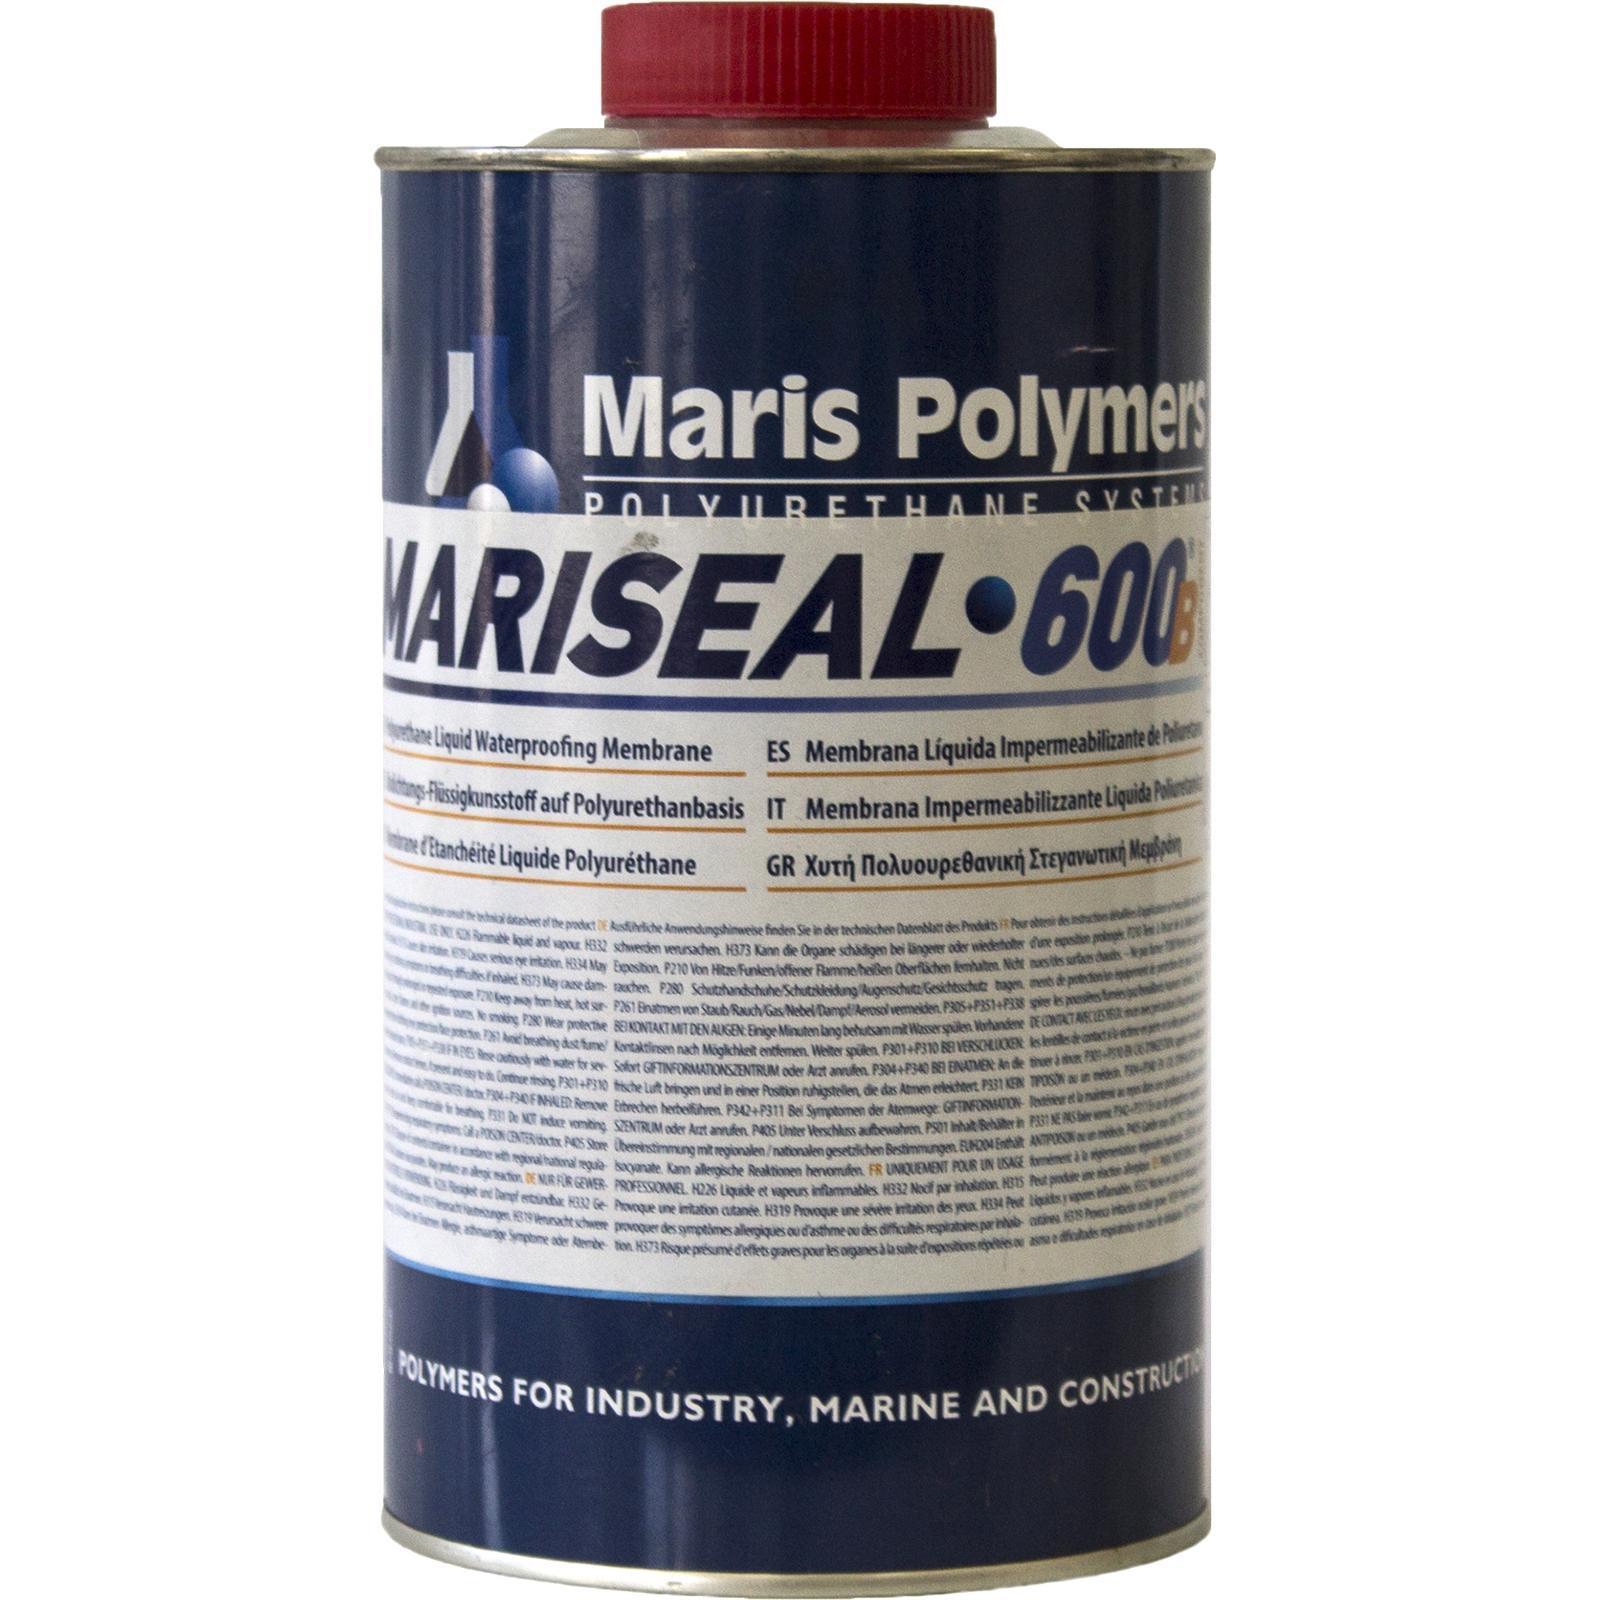 MARISEAL® 600